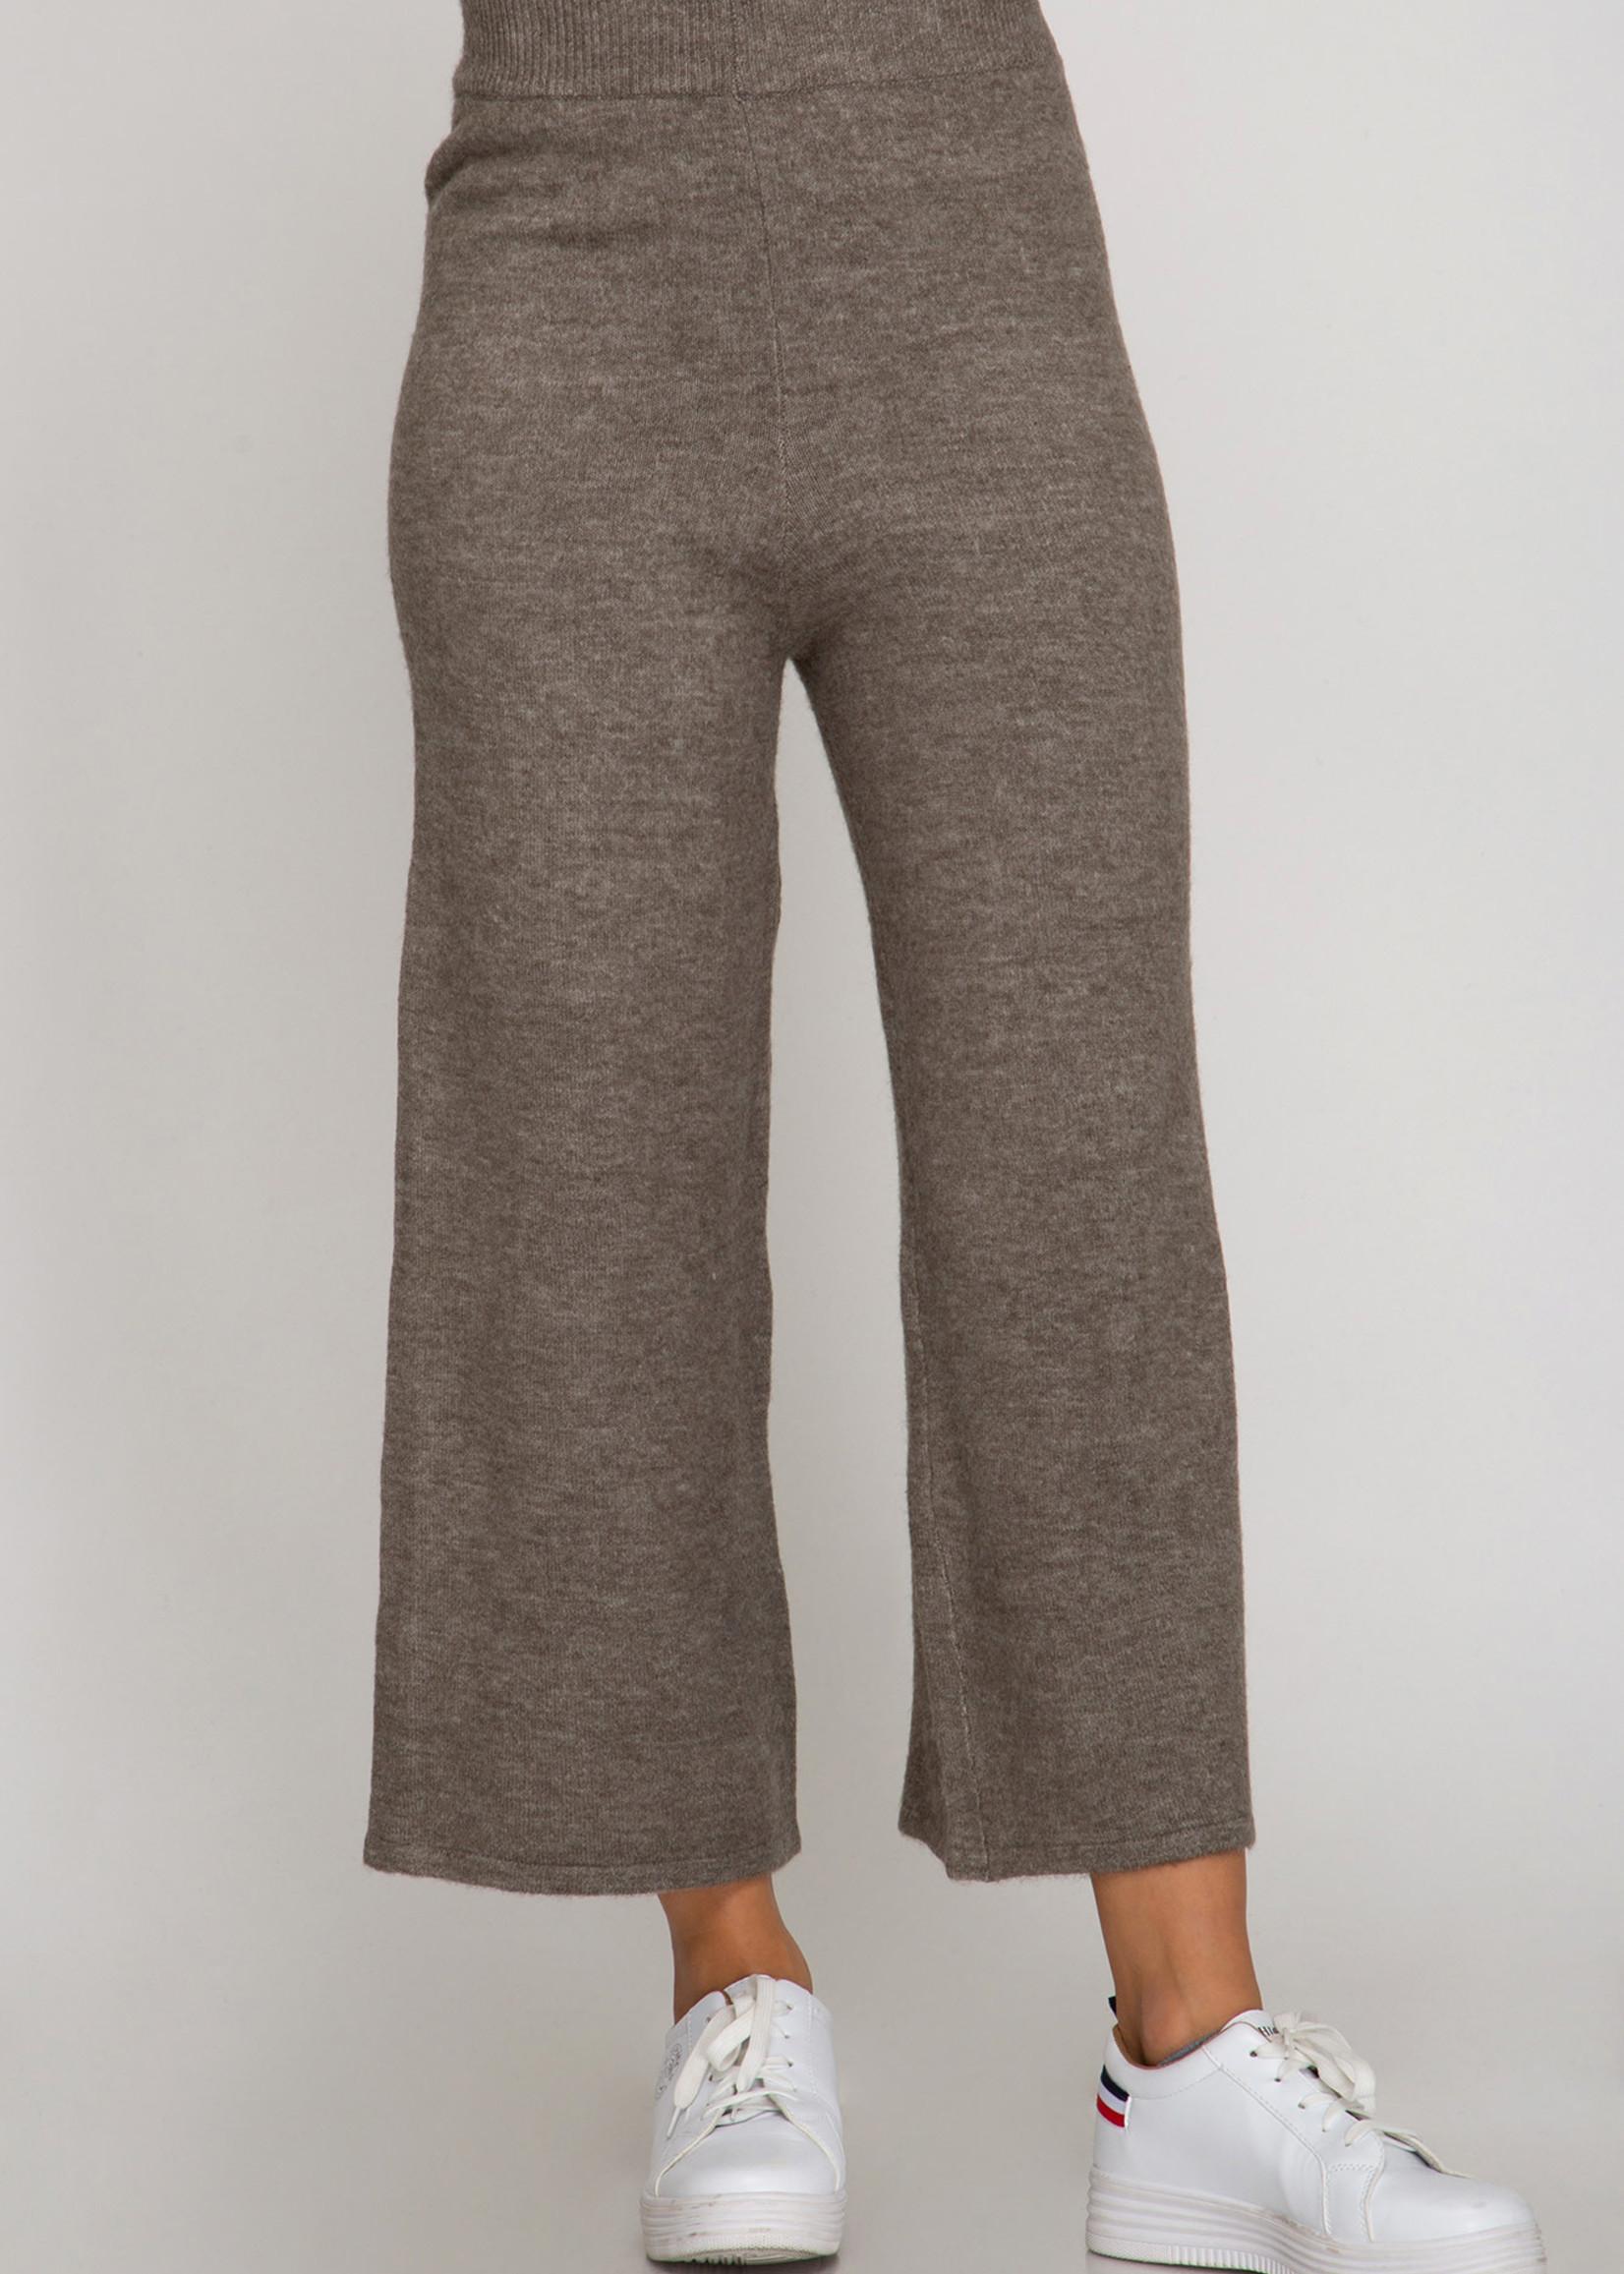 LeBLANC finds CROP wide leg sweater pant